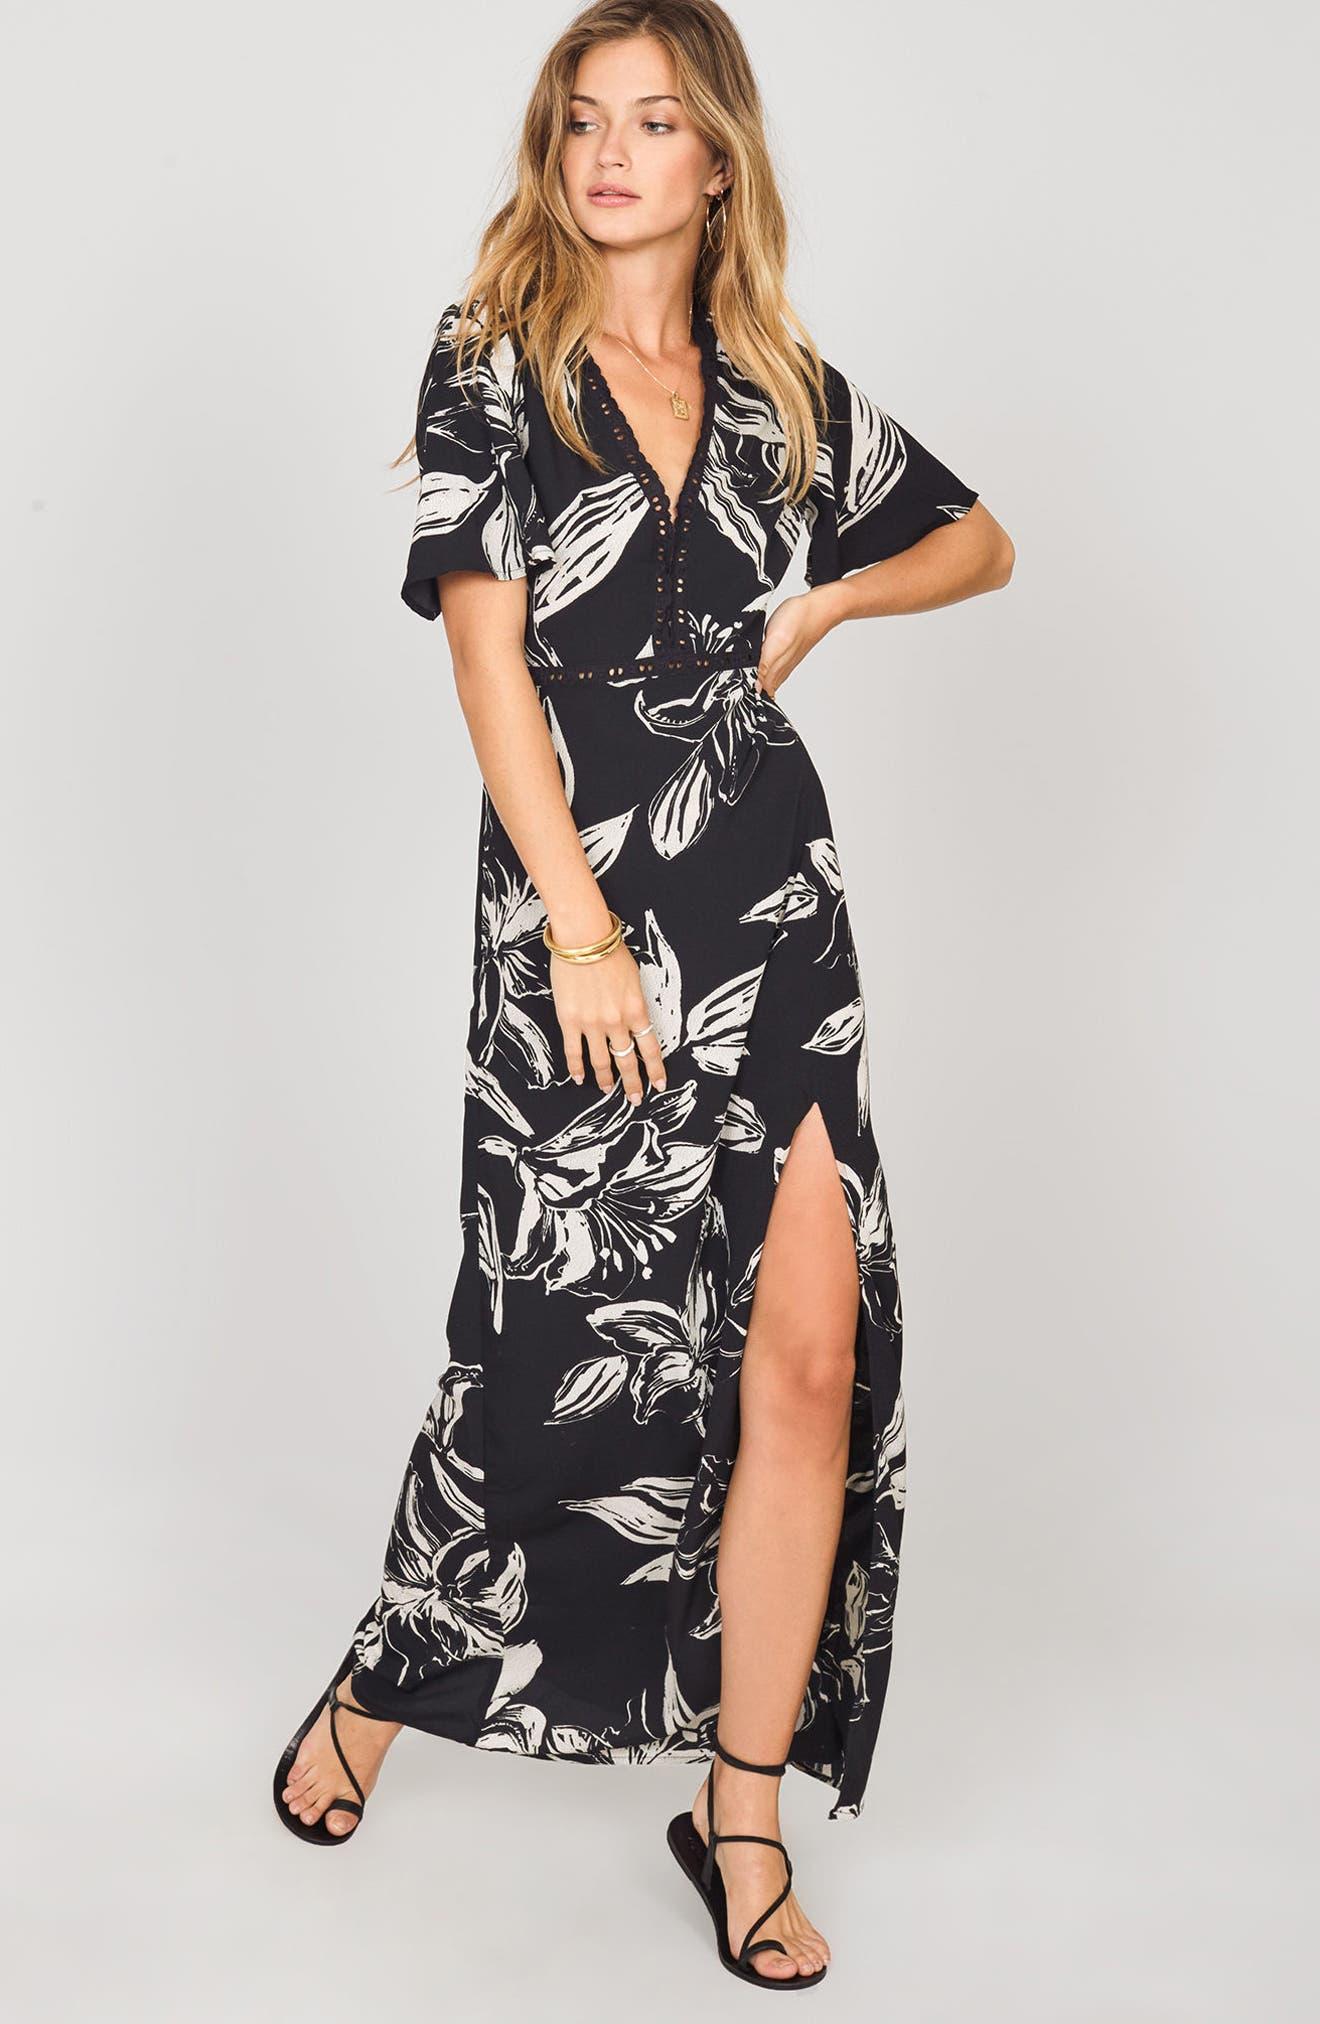 Seaside Floral Print Maxi Dress,                             Alternate thumbnail 2, color,                             Black Sands